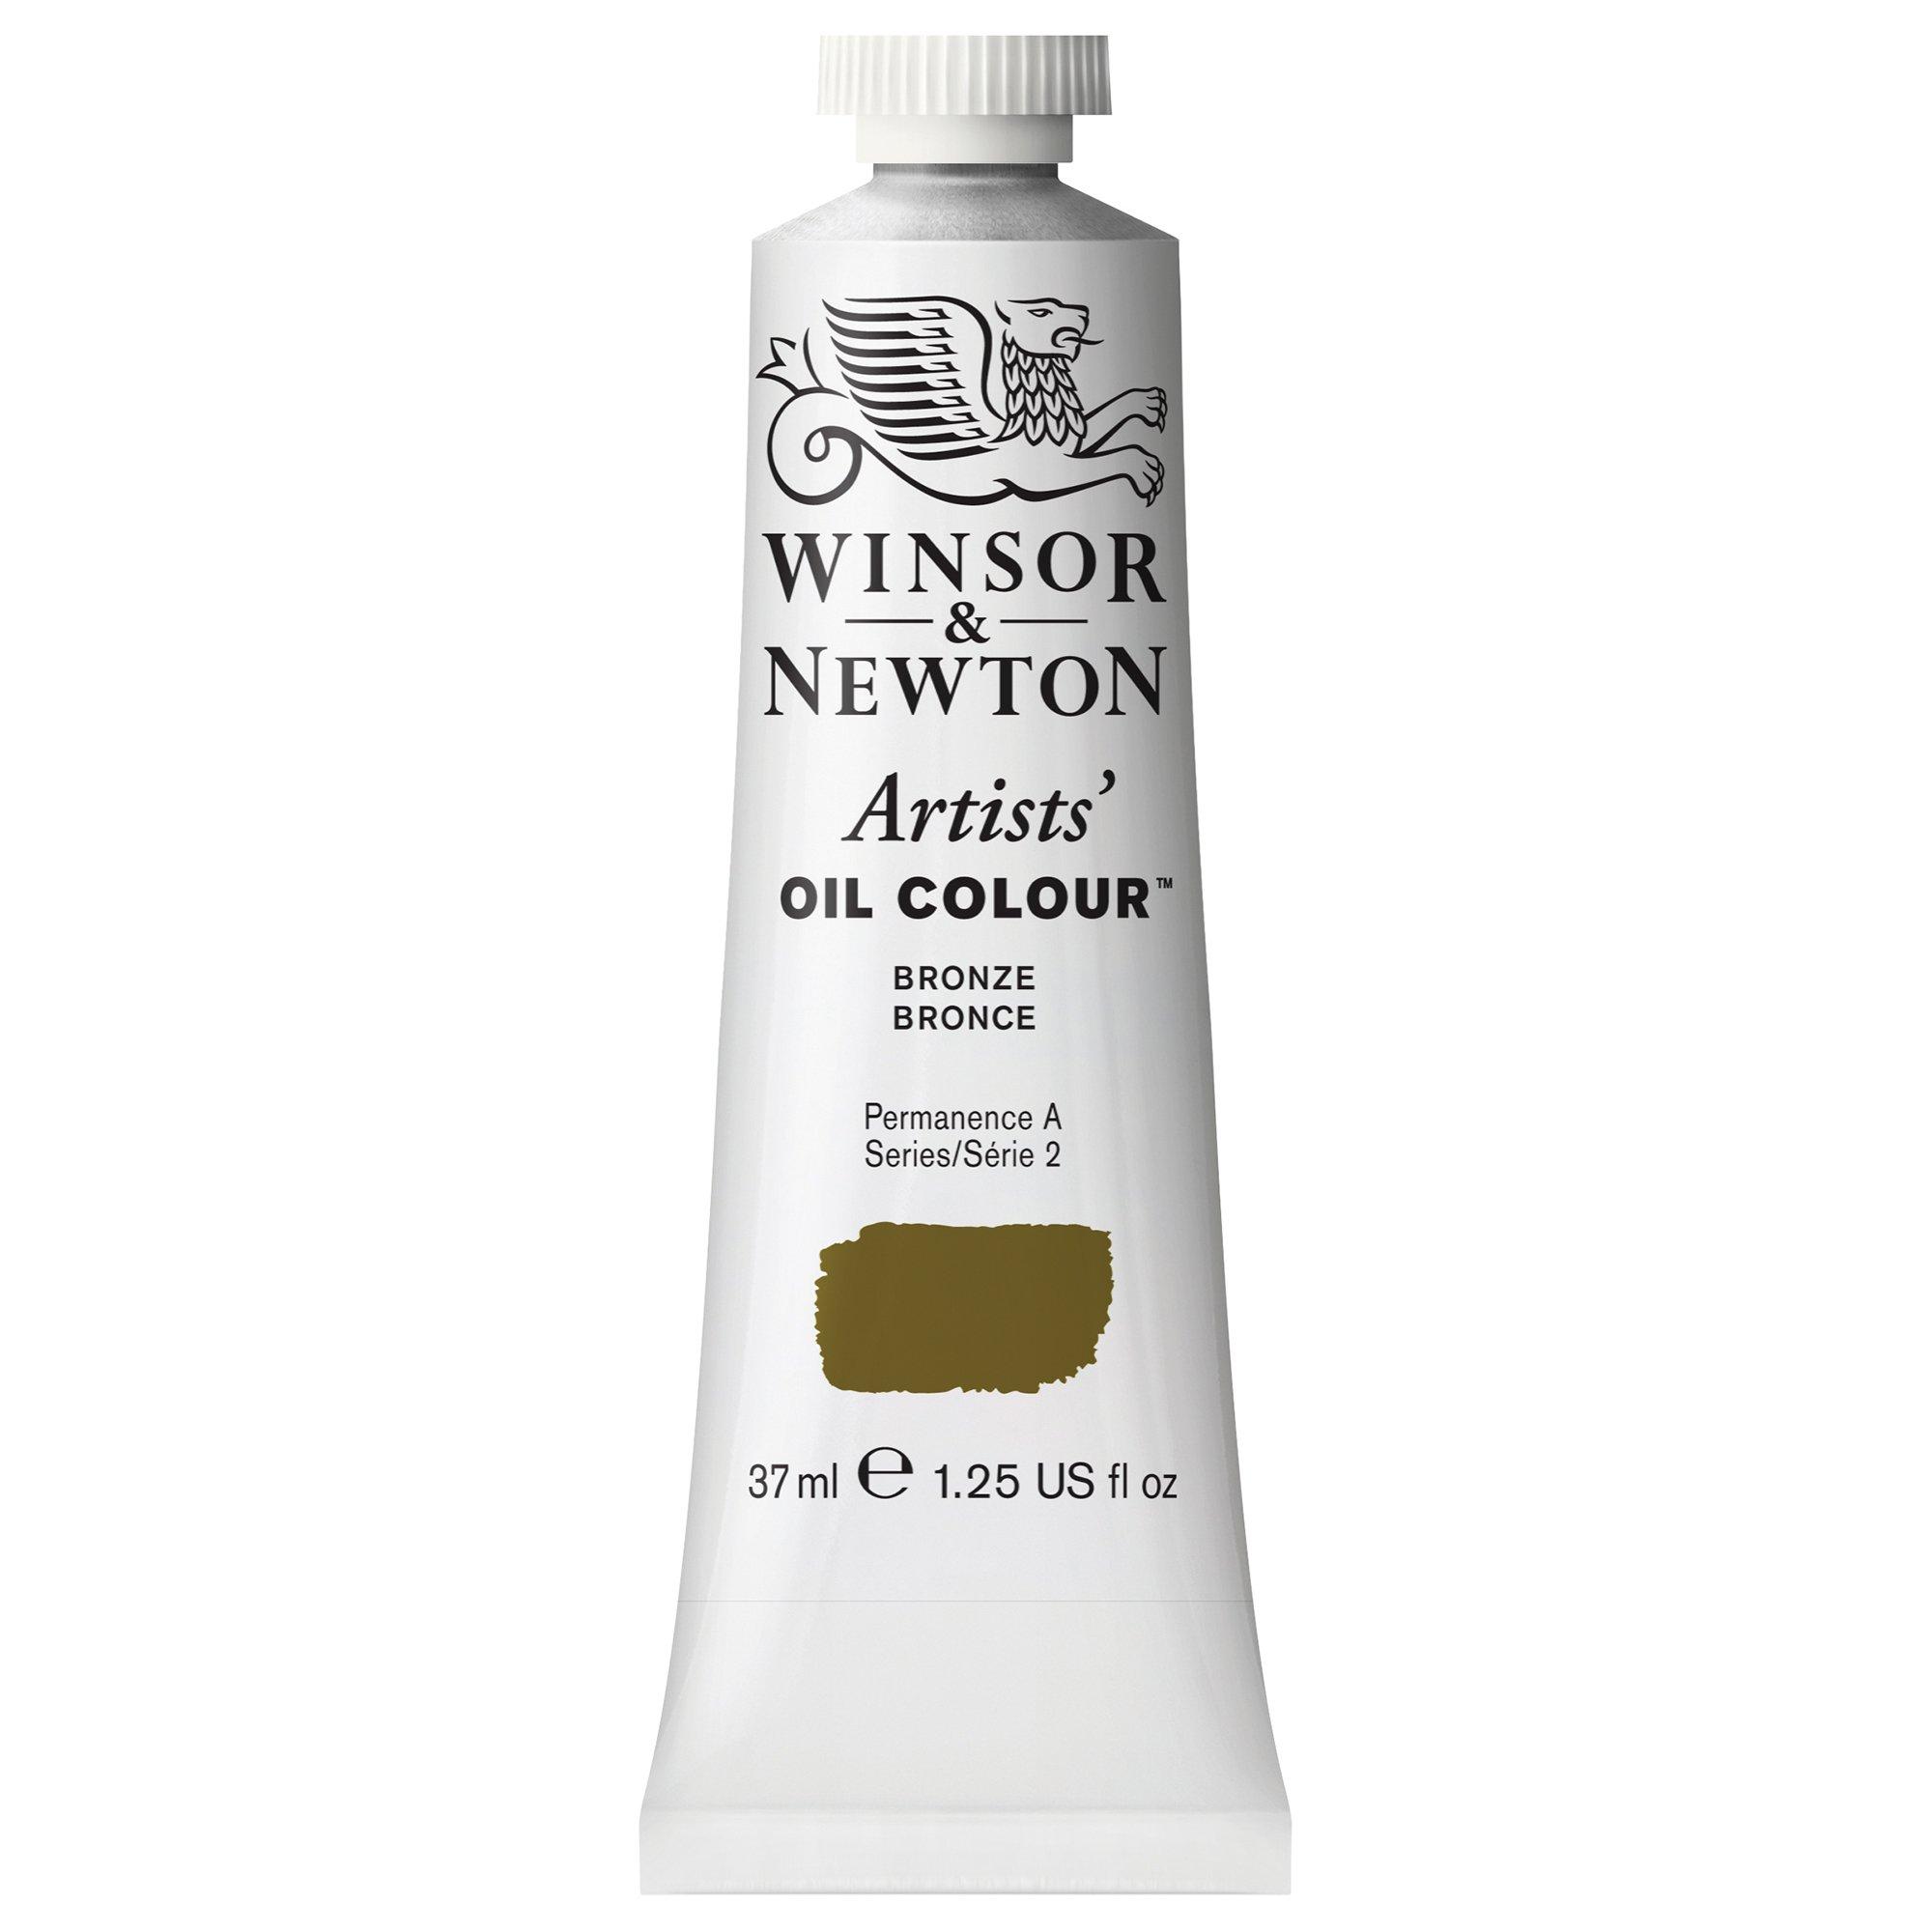 Winsor & Newton Artists' Oil Colour Paint, 37ml Tube, Bronze